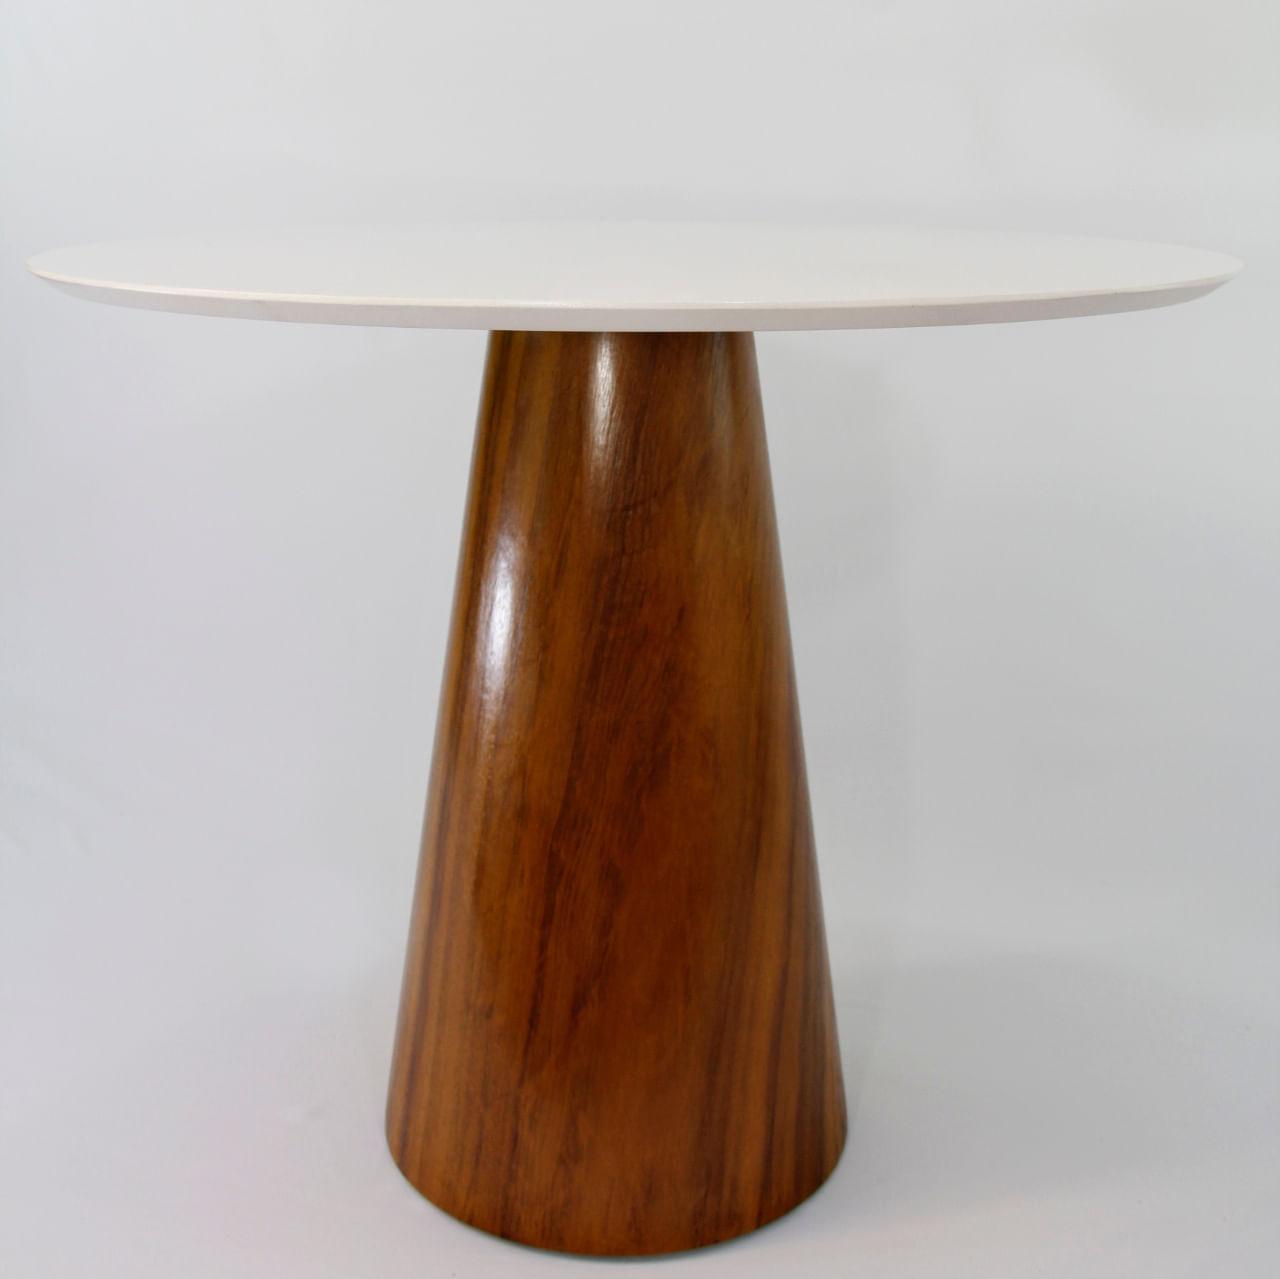 Mesa de Jantar Cone 110 cm Base Madeira Imbuia